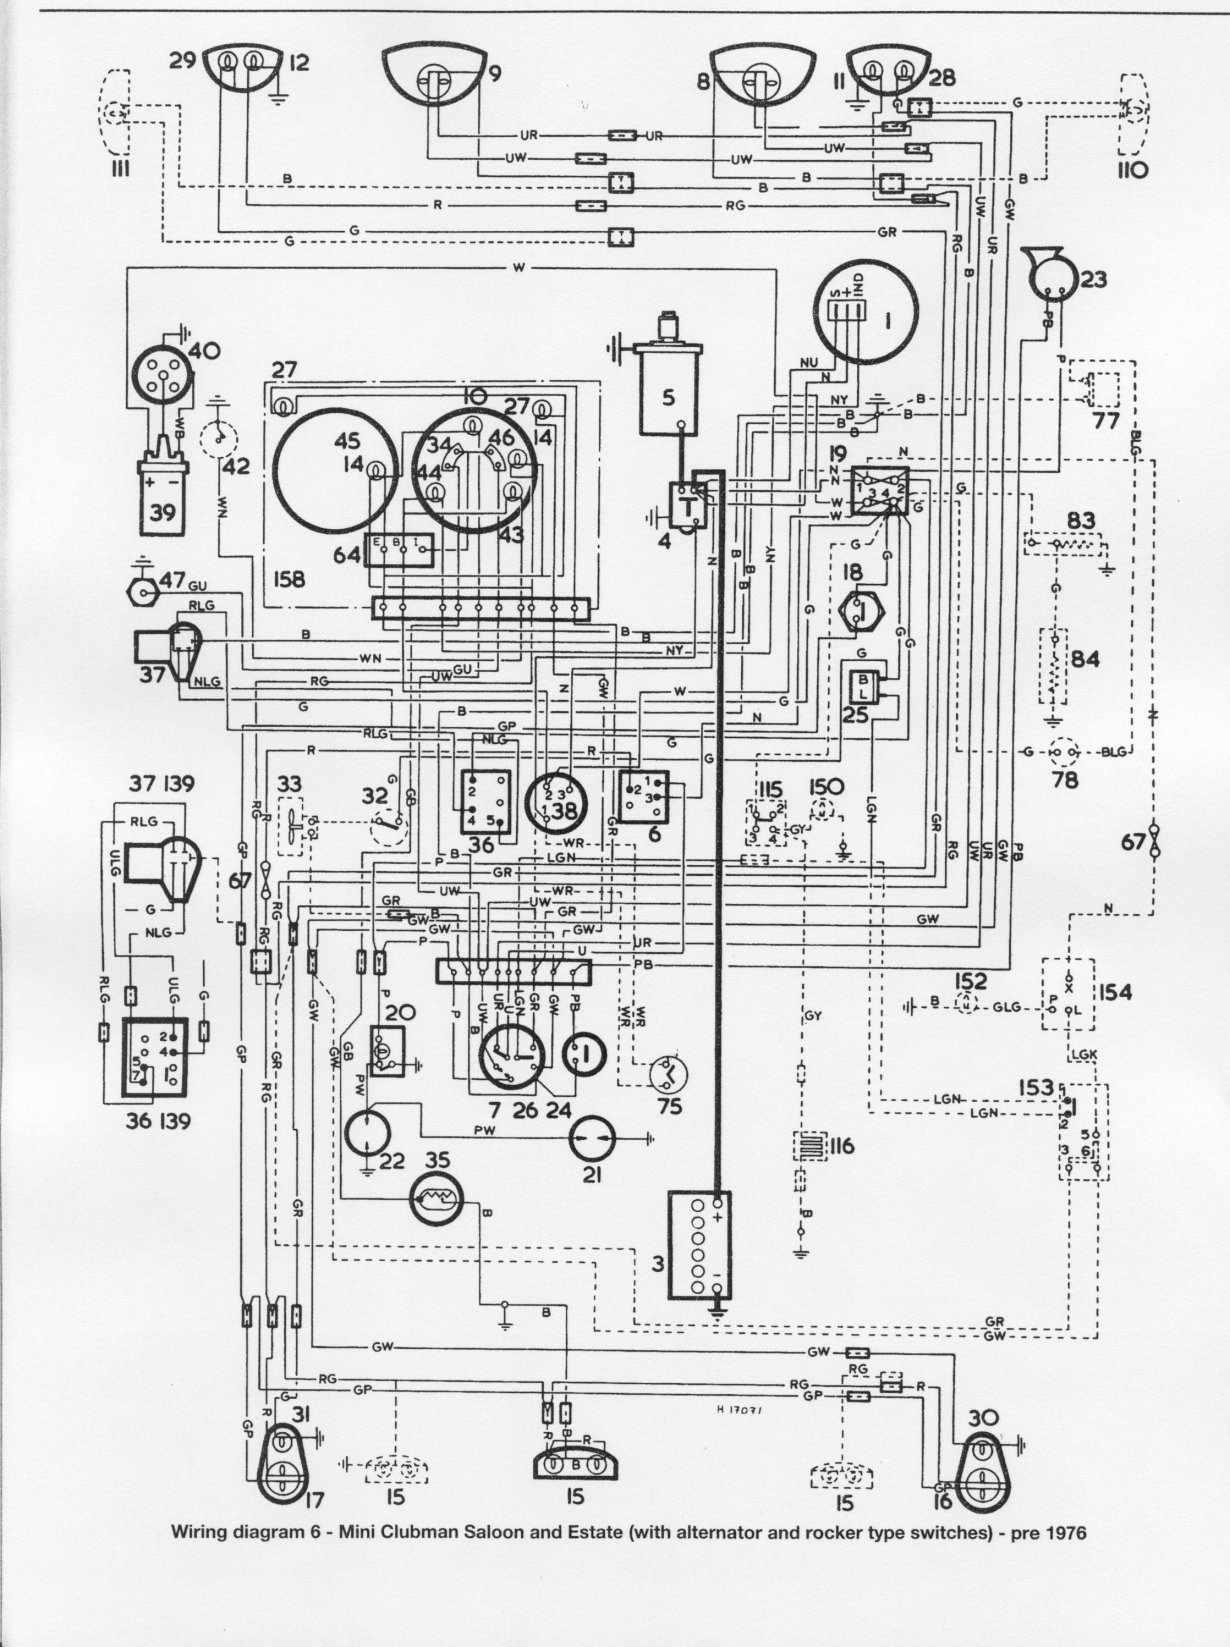 small resolution of 1990 mini cooper wiring diagram wiring diagram user 1990 mini cooper wiring diagram wiring diagrams konsult